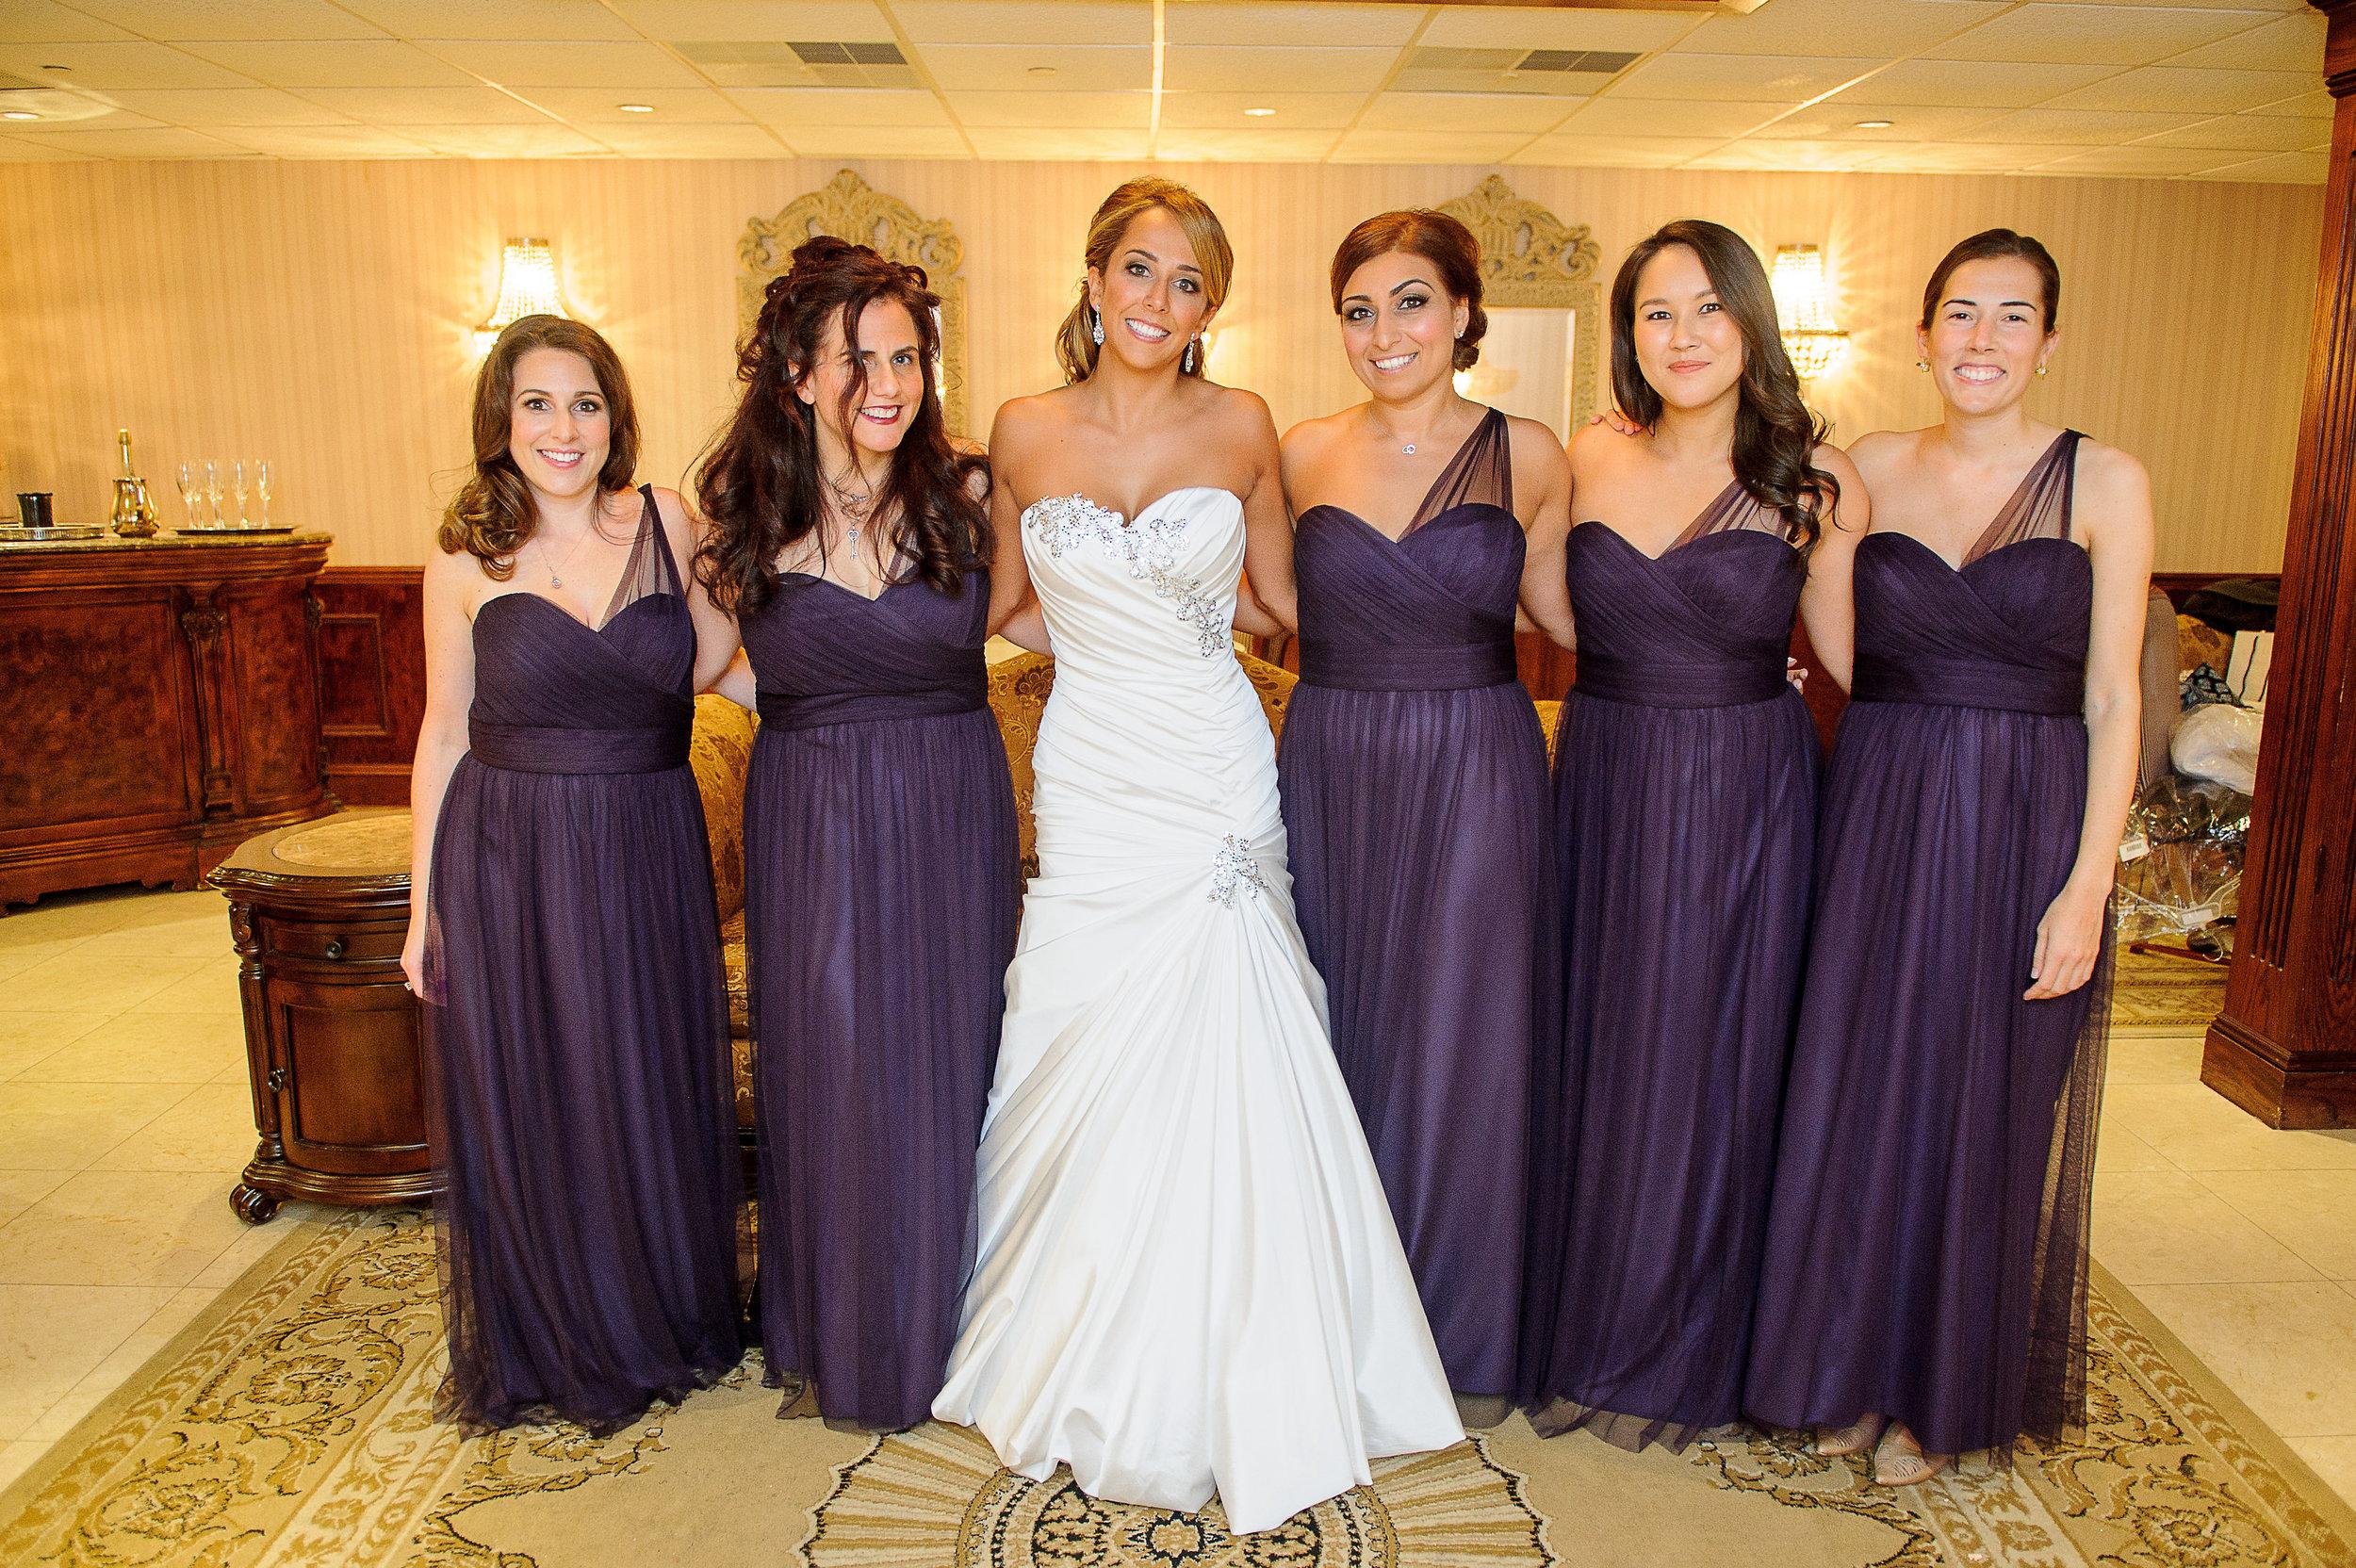 Ceci_New_York_Custom_Invitation_ New_Jersey_Wedding_Luxury_Personalized_Ceci_Style_Bride_Foil_Stamping83.JPG